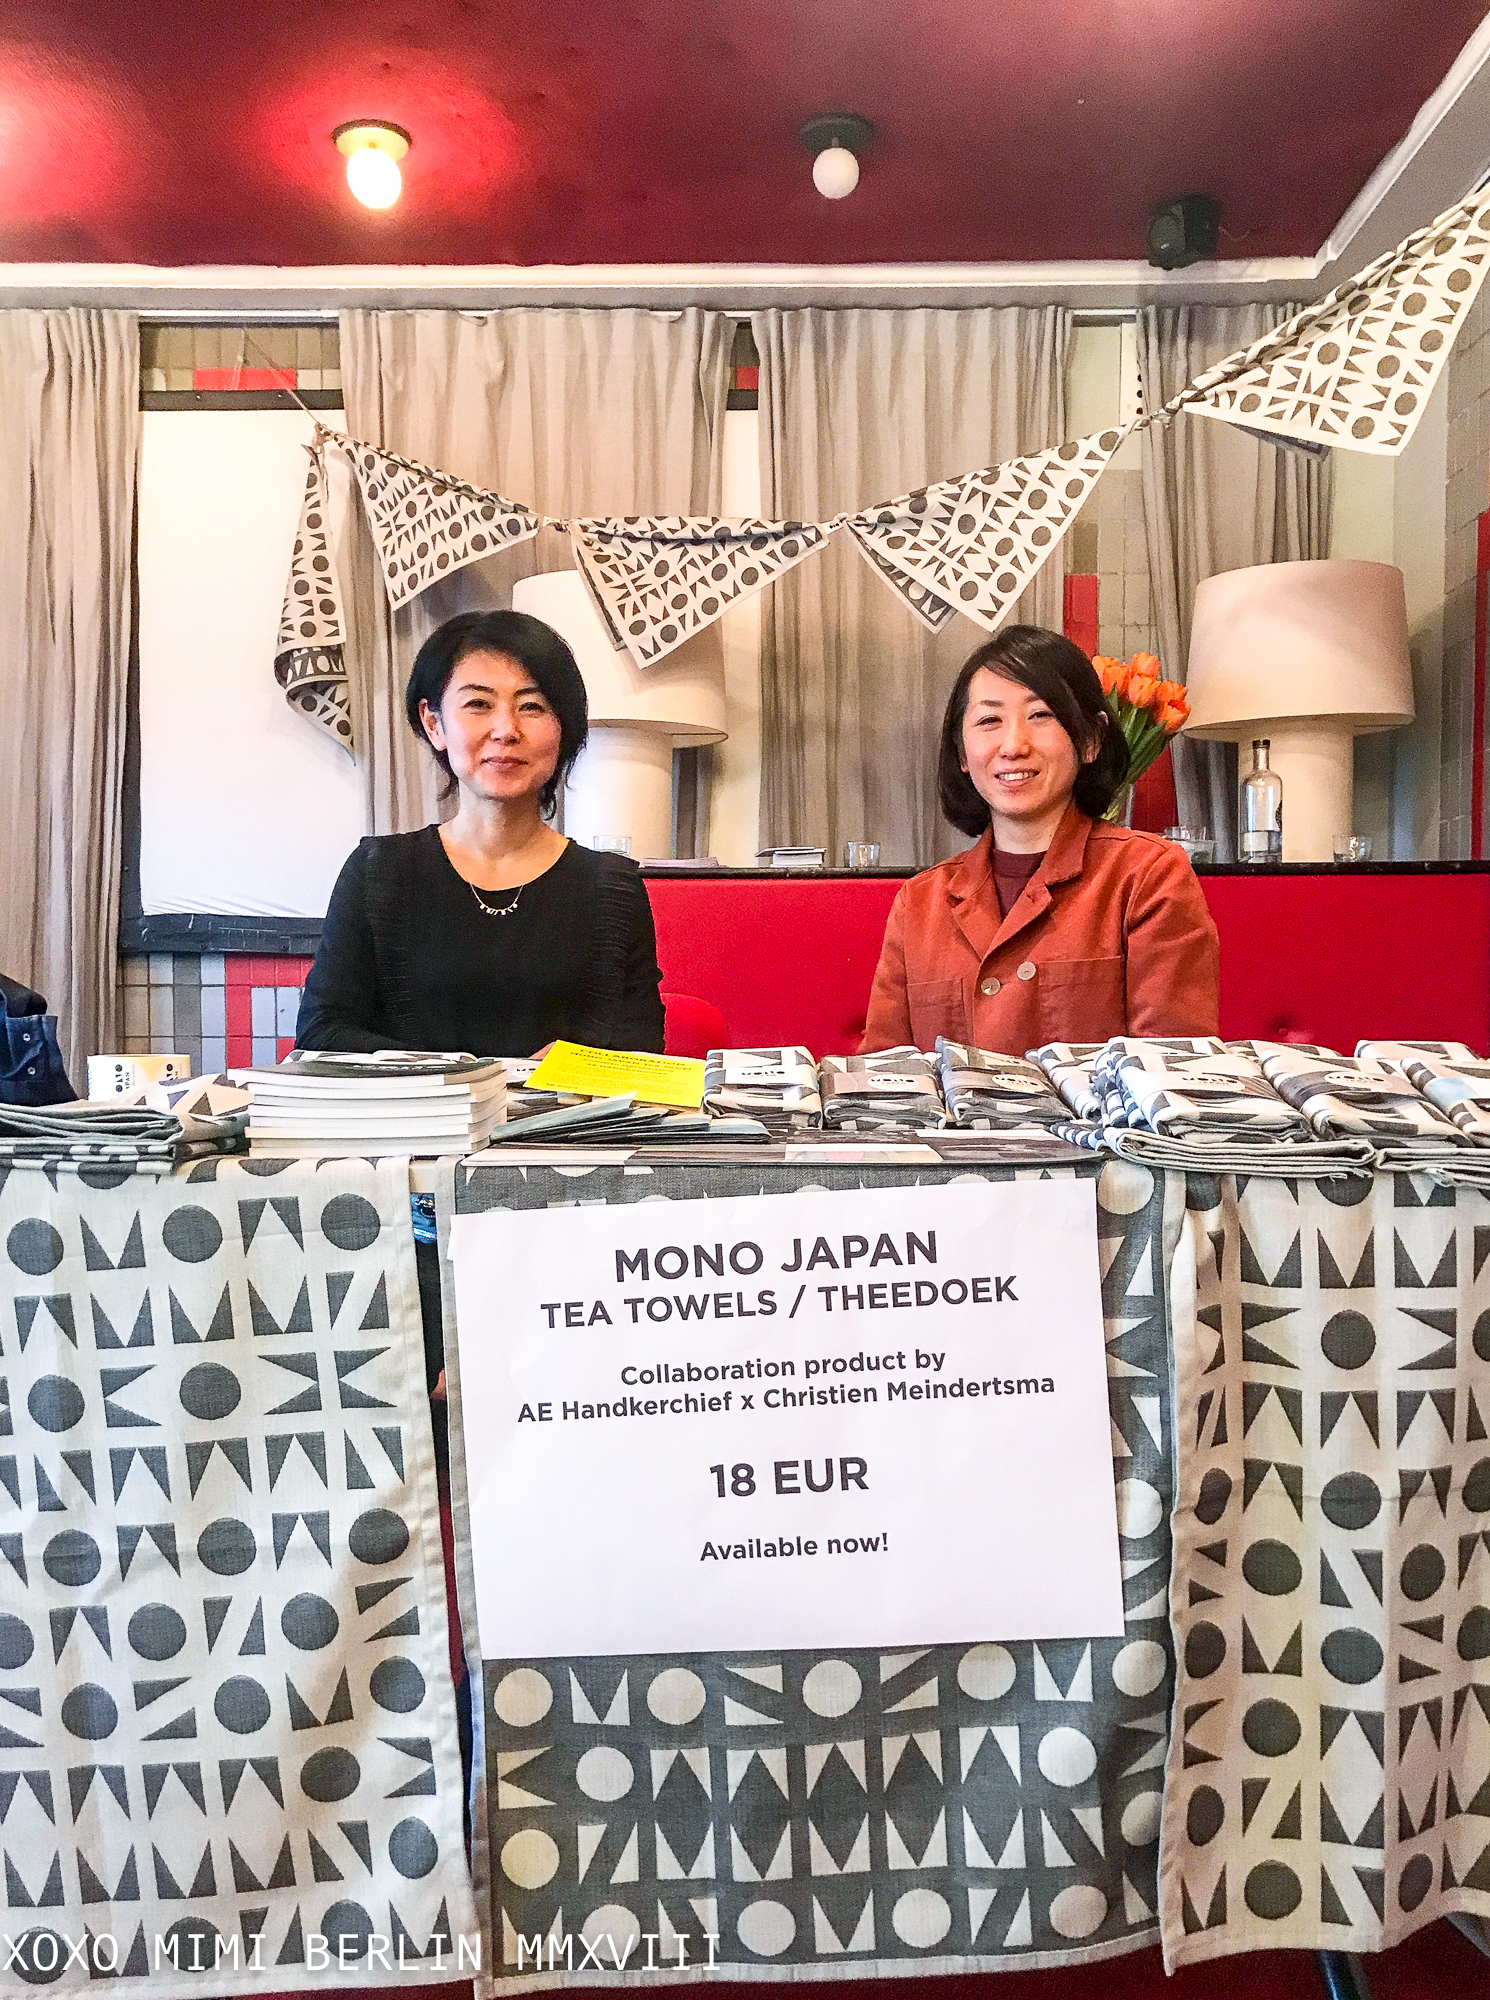 Mono Japan in Amsterdam